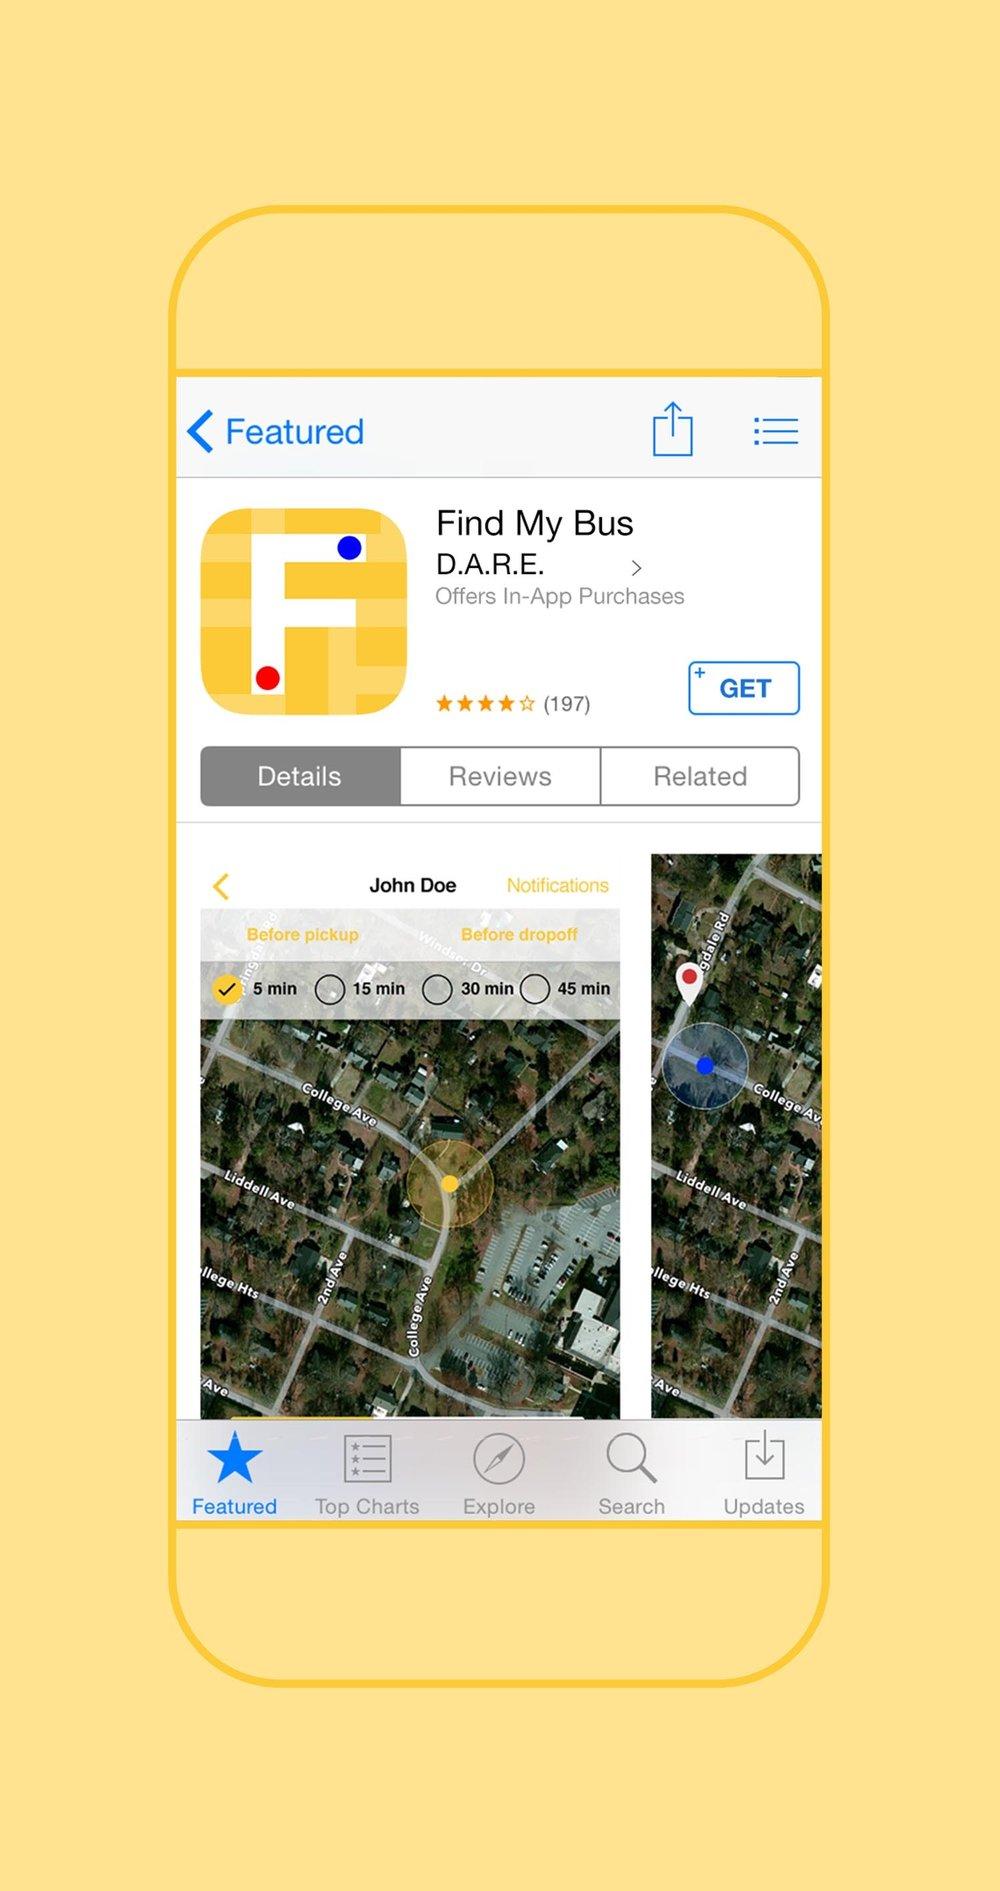 web_busApp-phone-mockup_1.jpg